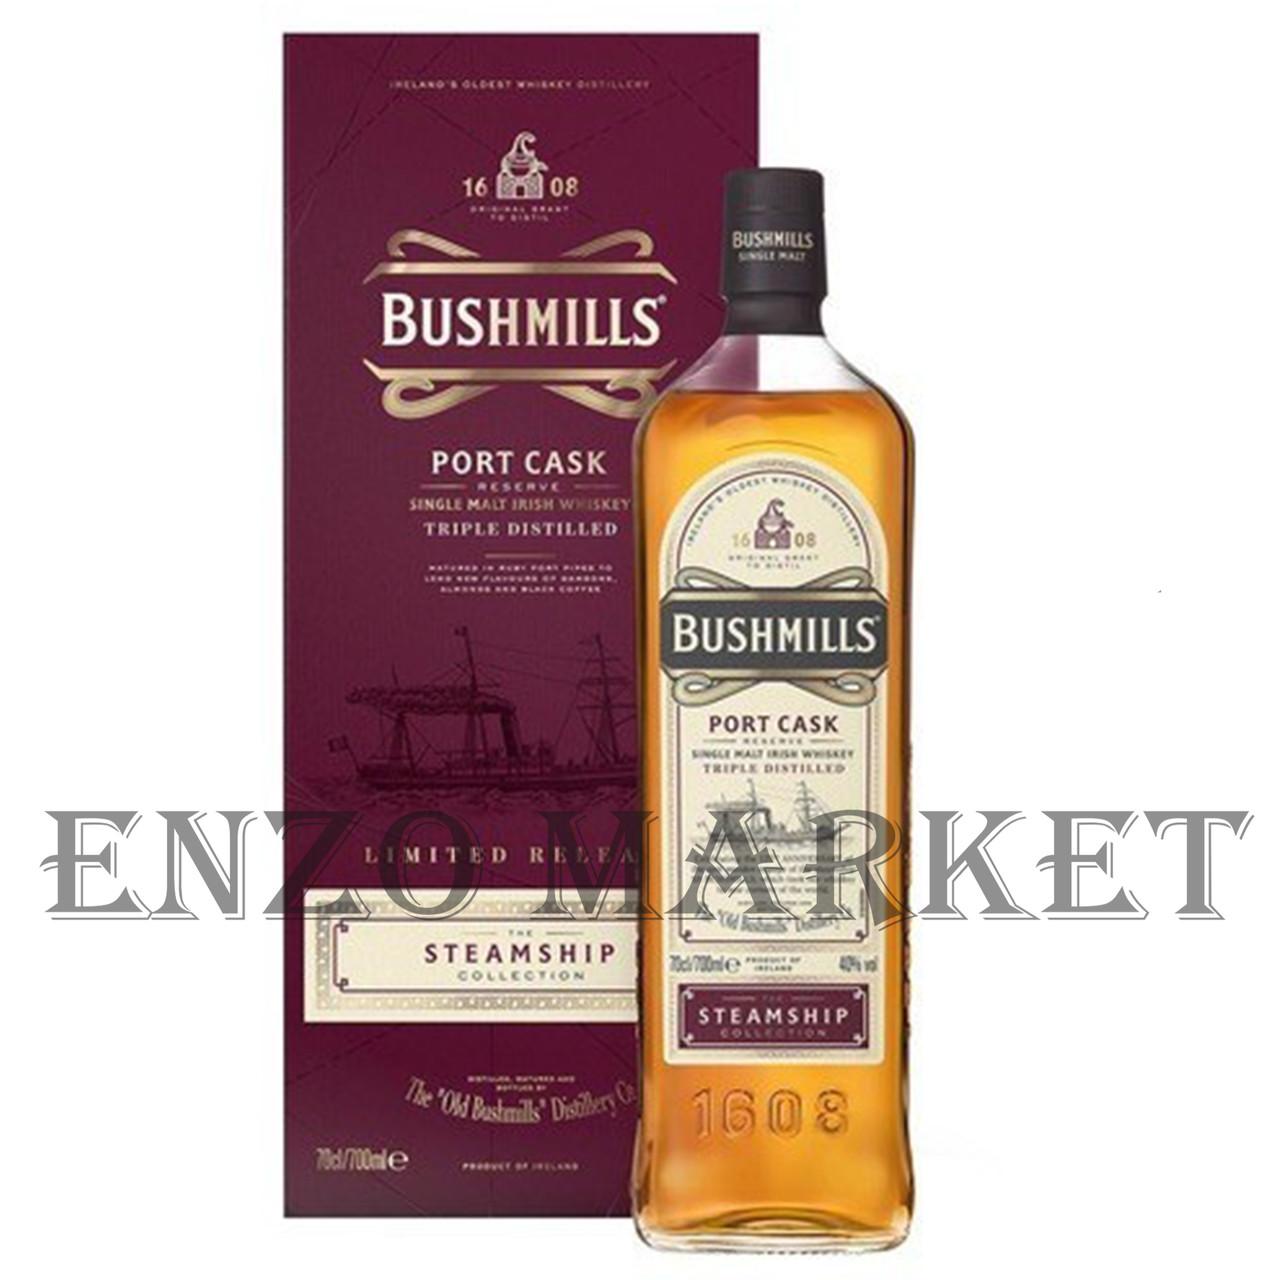 Виски Bushmills Steamship Port Cask (Бушмиллс Стемшип Порт Каск) 40%, 0,7 литр